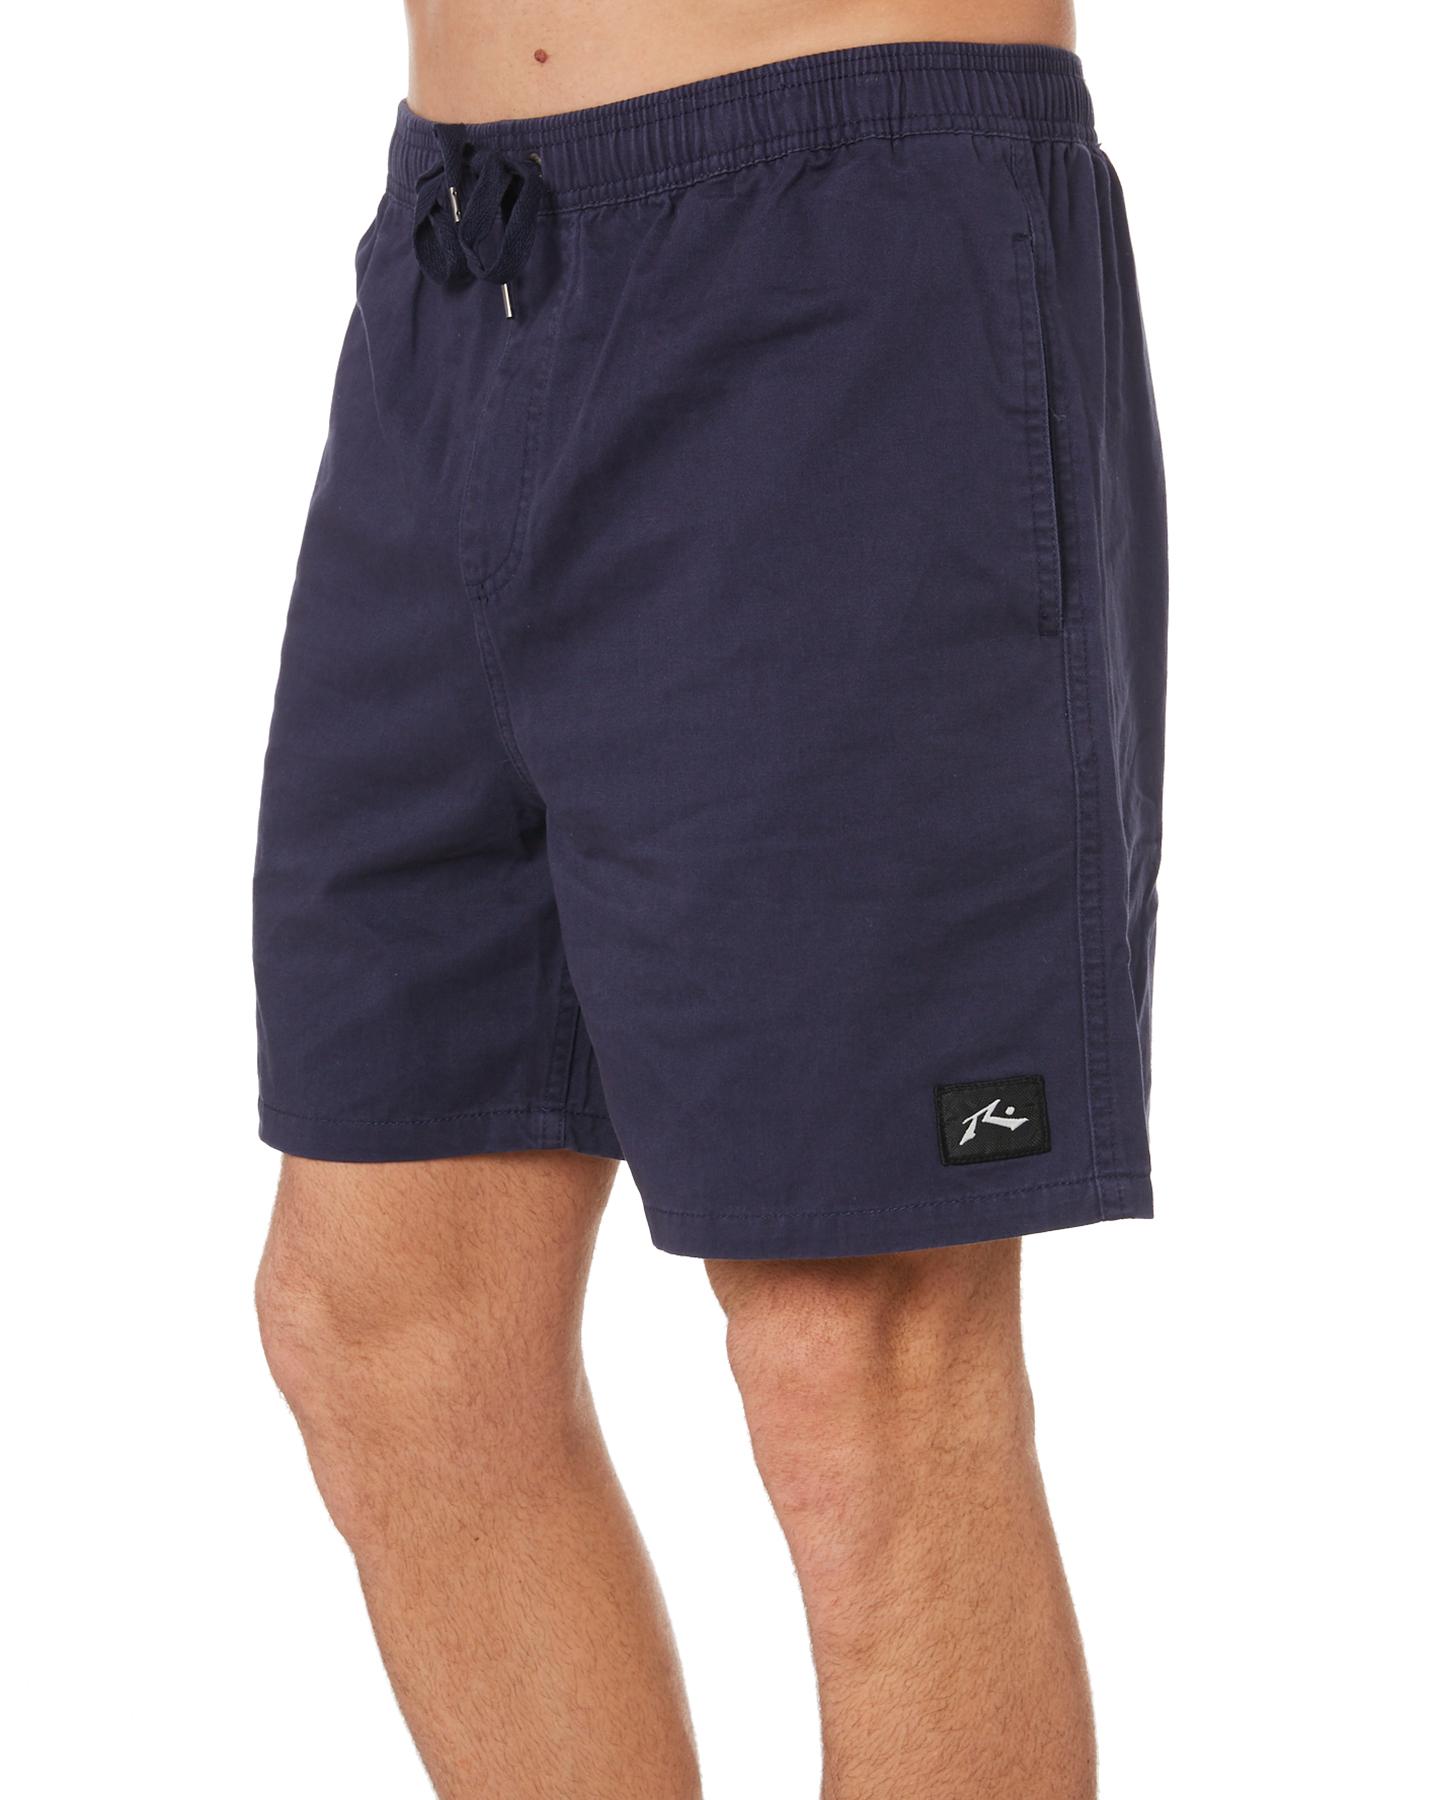 New-Rusty-Men-039-s-Hook-Elastic-Short-Cotton-Blue thumbnail 12